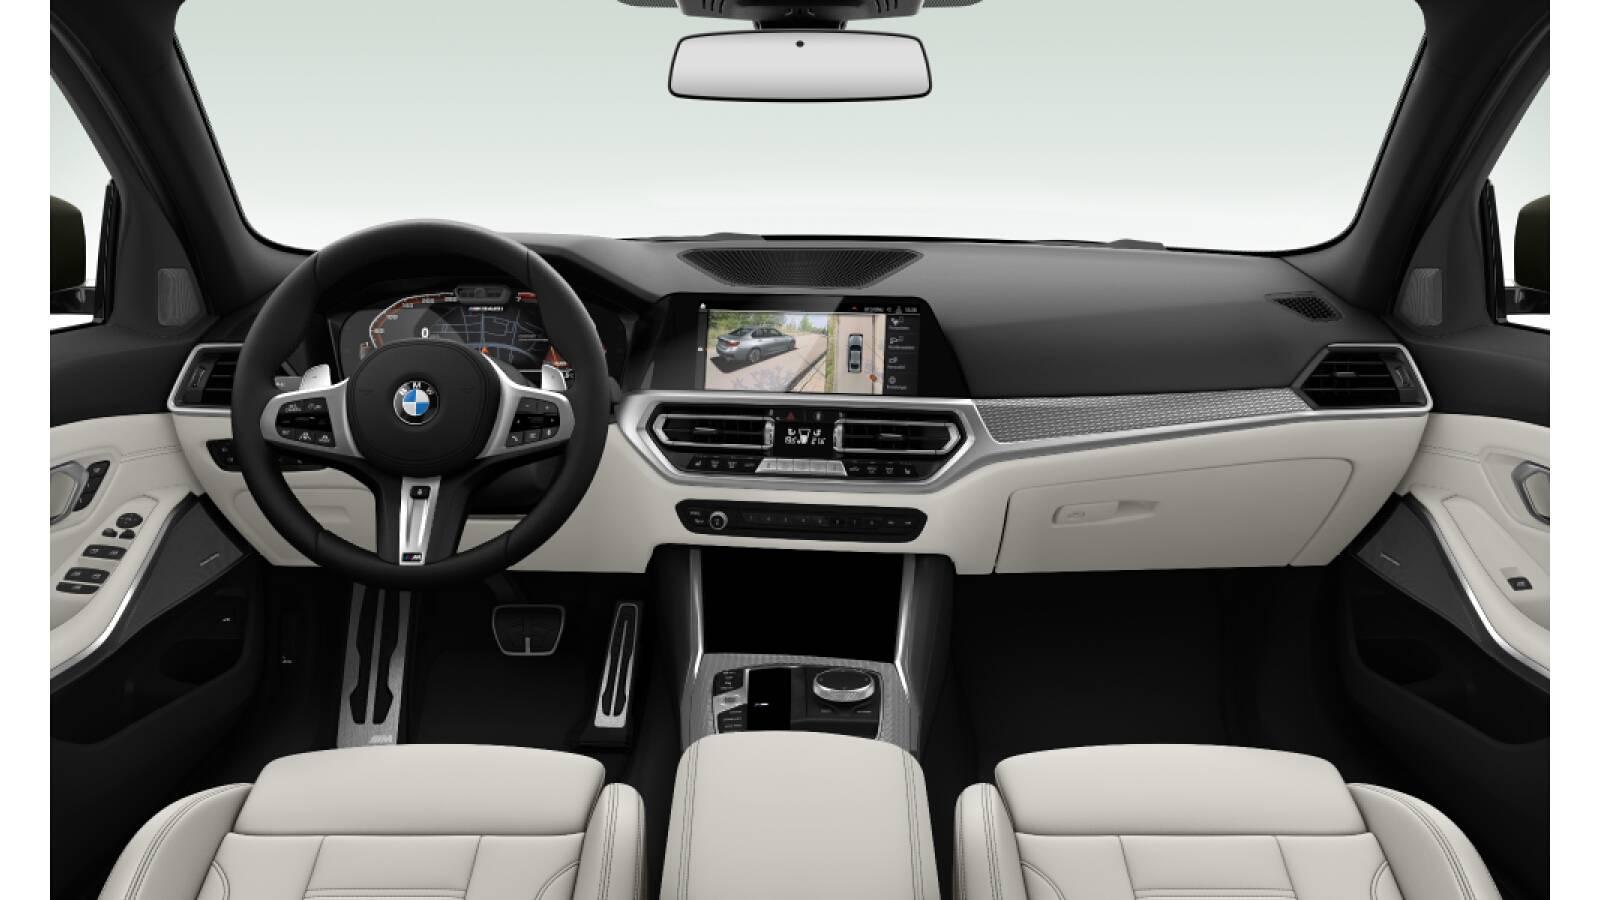 BMW 3 Series 2019 leaked photos (27)